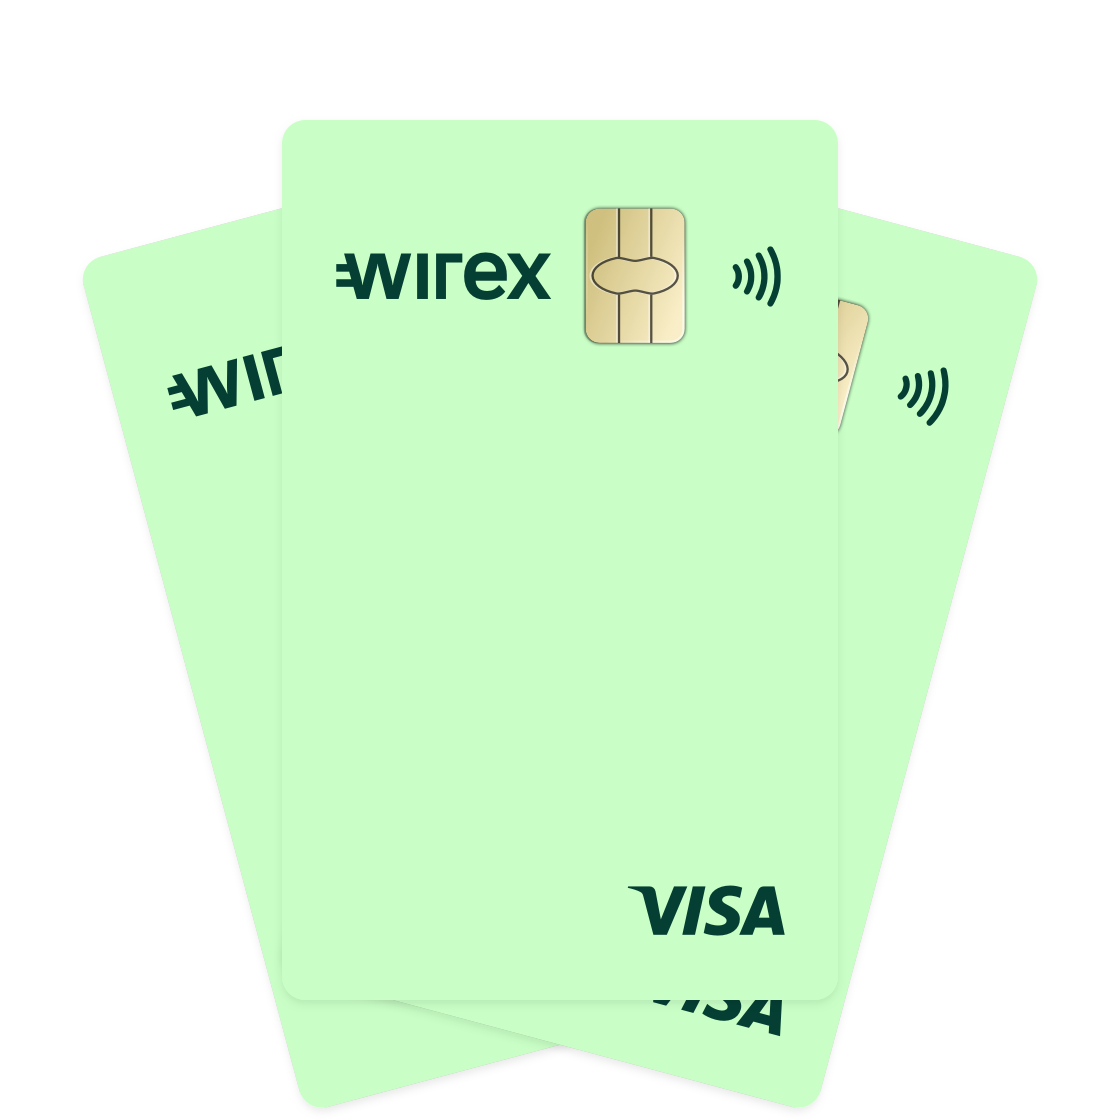 Wirex Karte.Crypto Fiat Multi Currency Wirex Visa Card Wirex